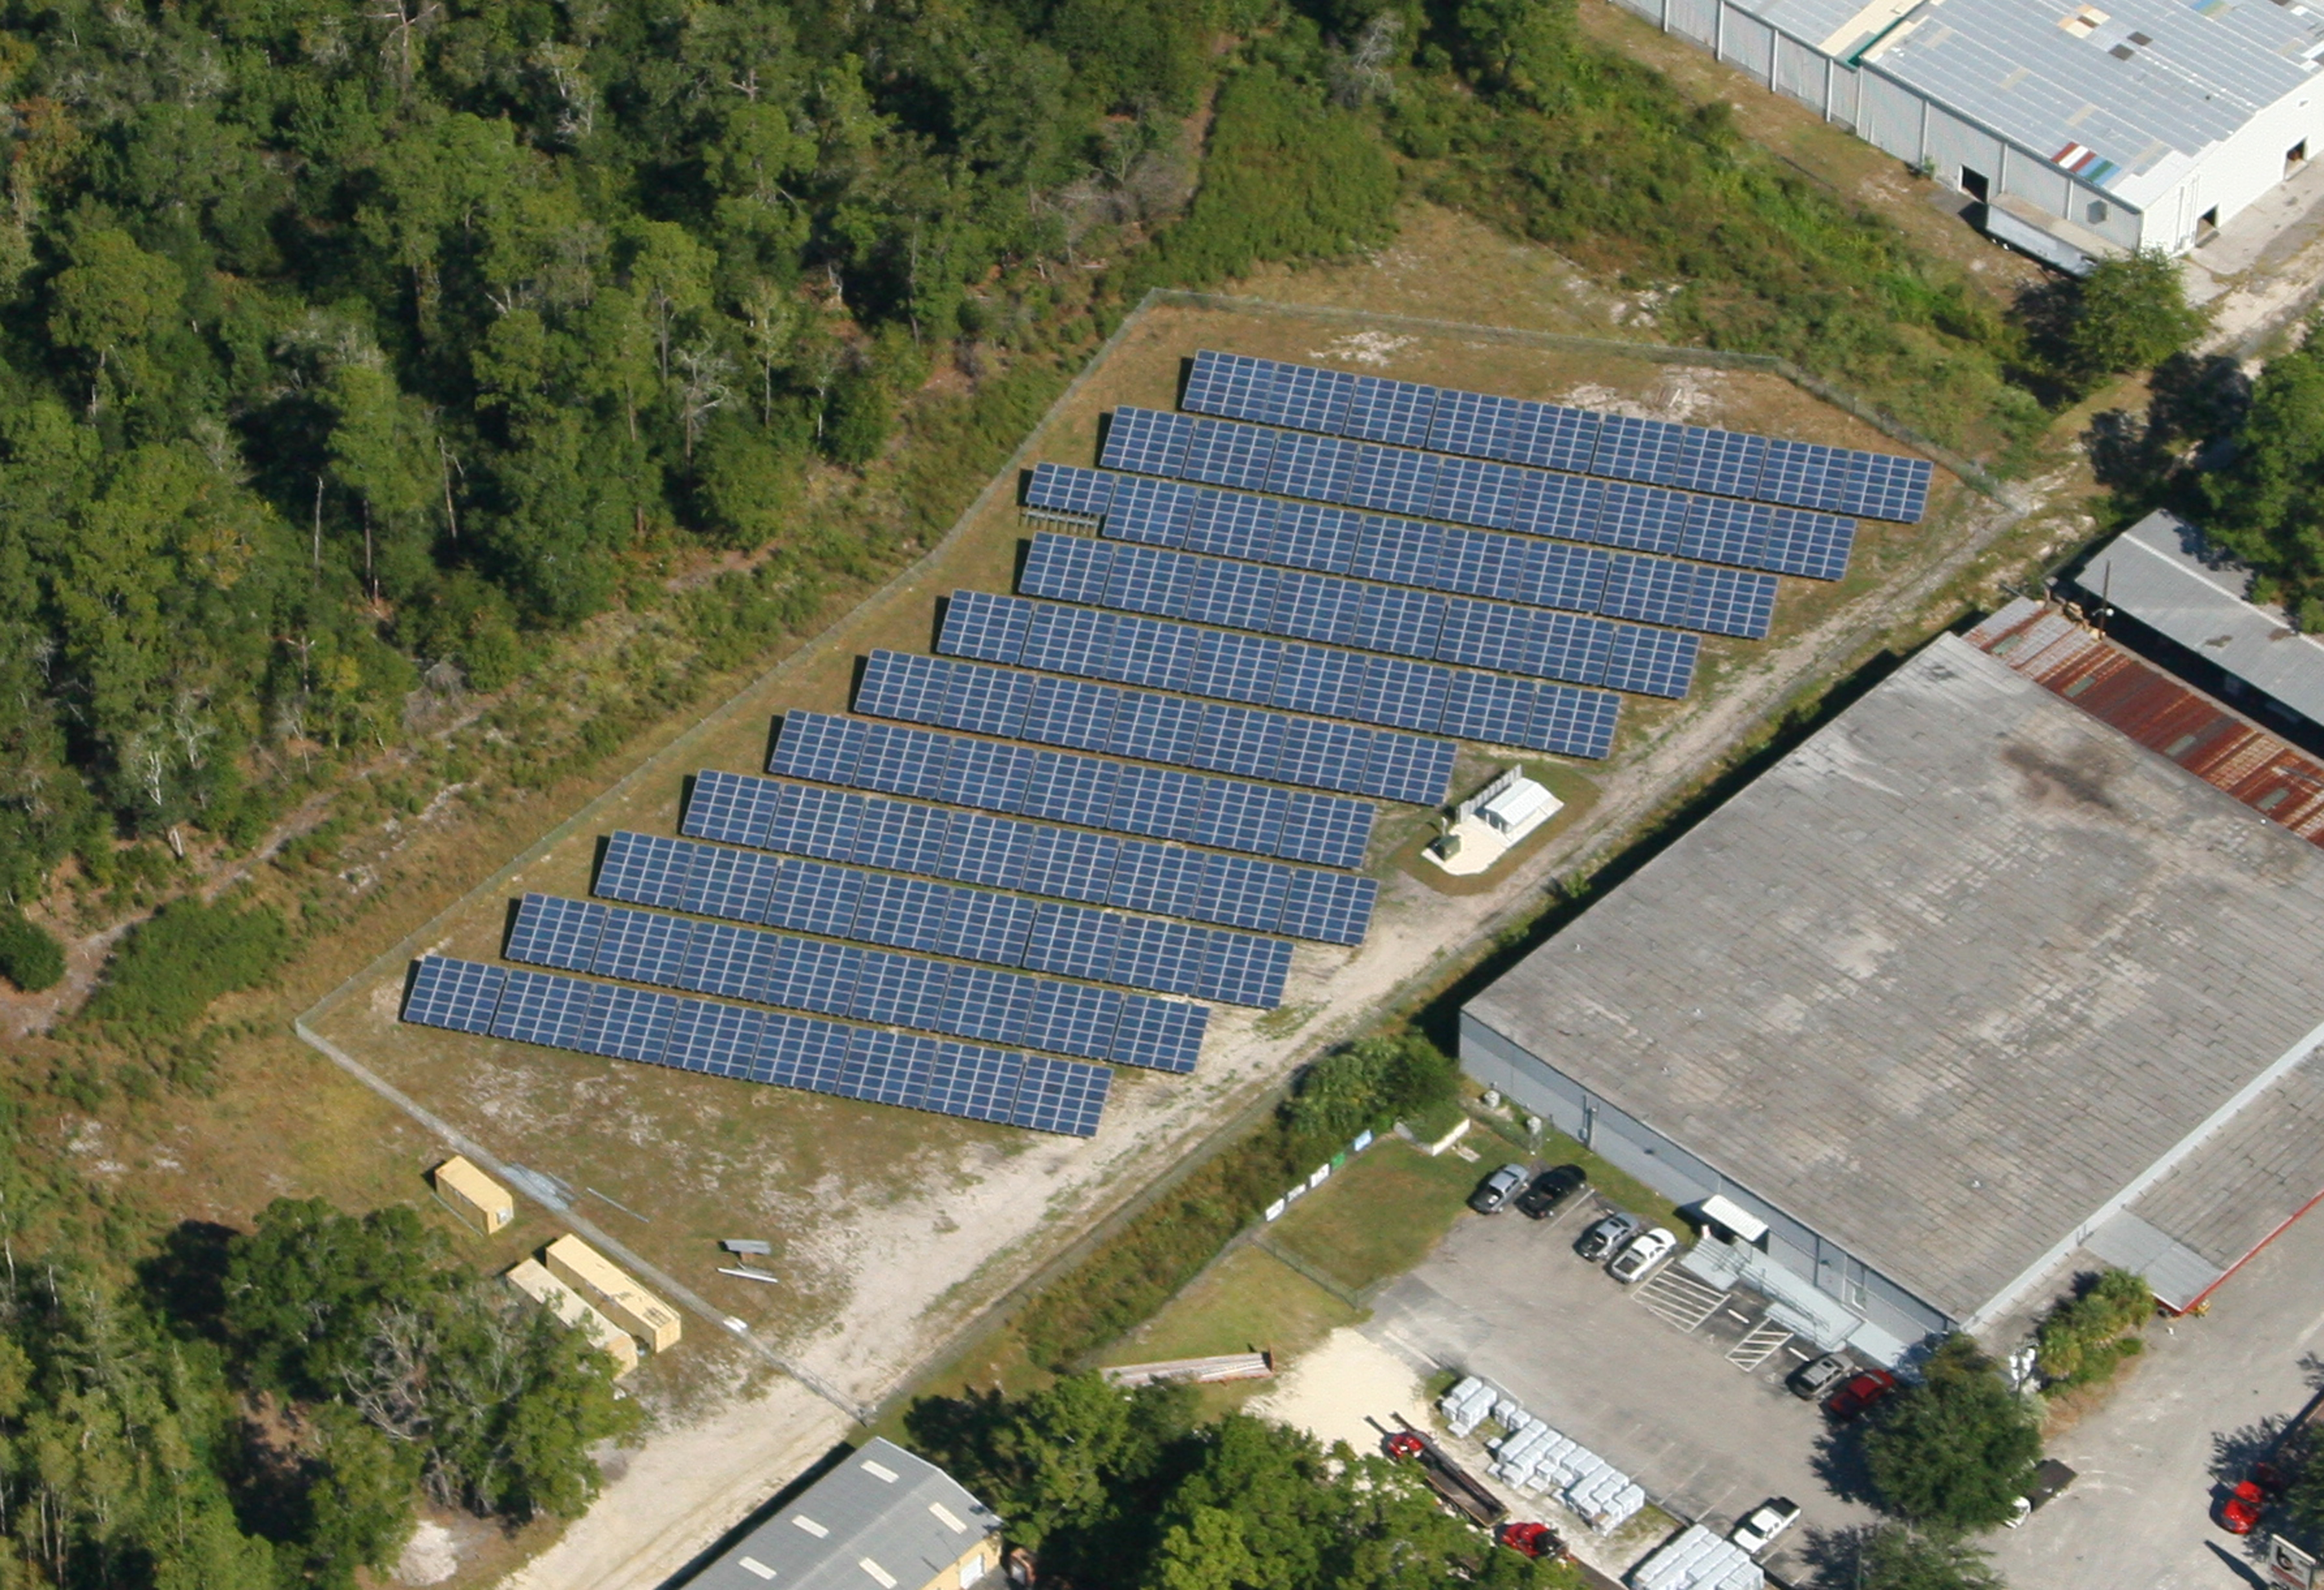 Waldo Solar Park